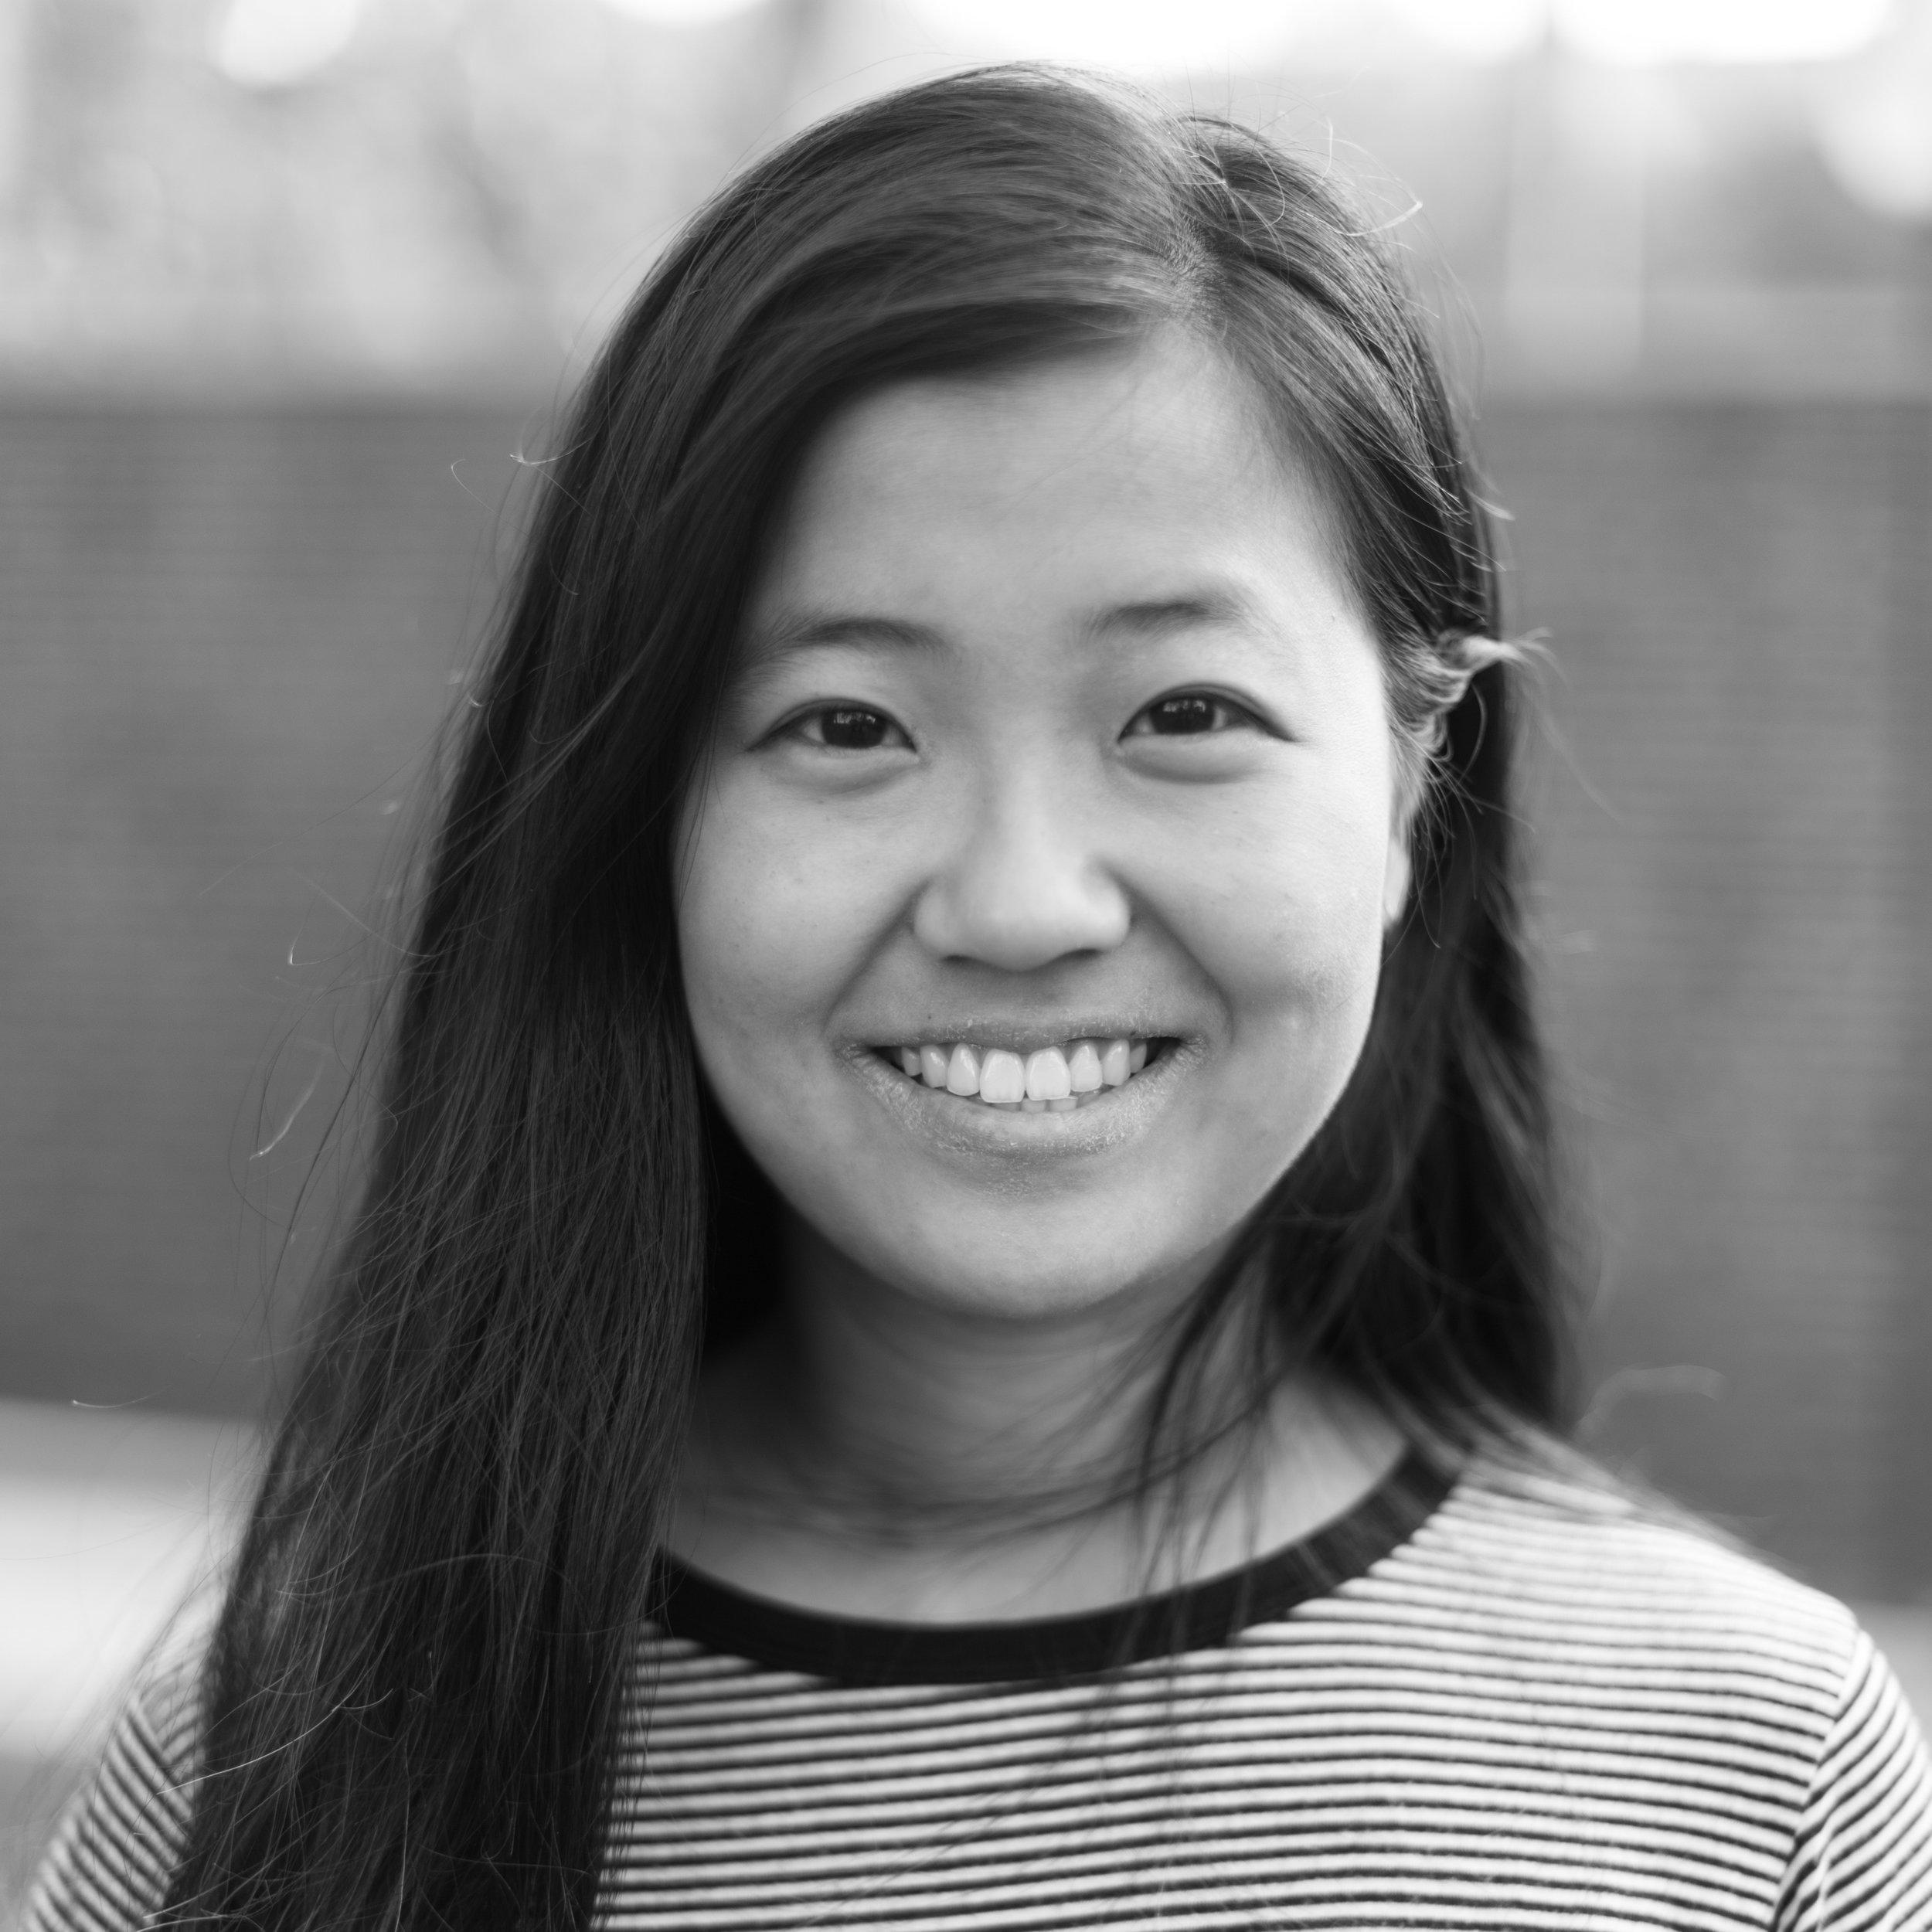 Jessy Lin - MIT 2019 | Computer Science major